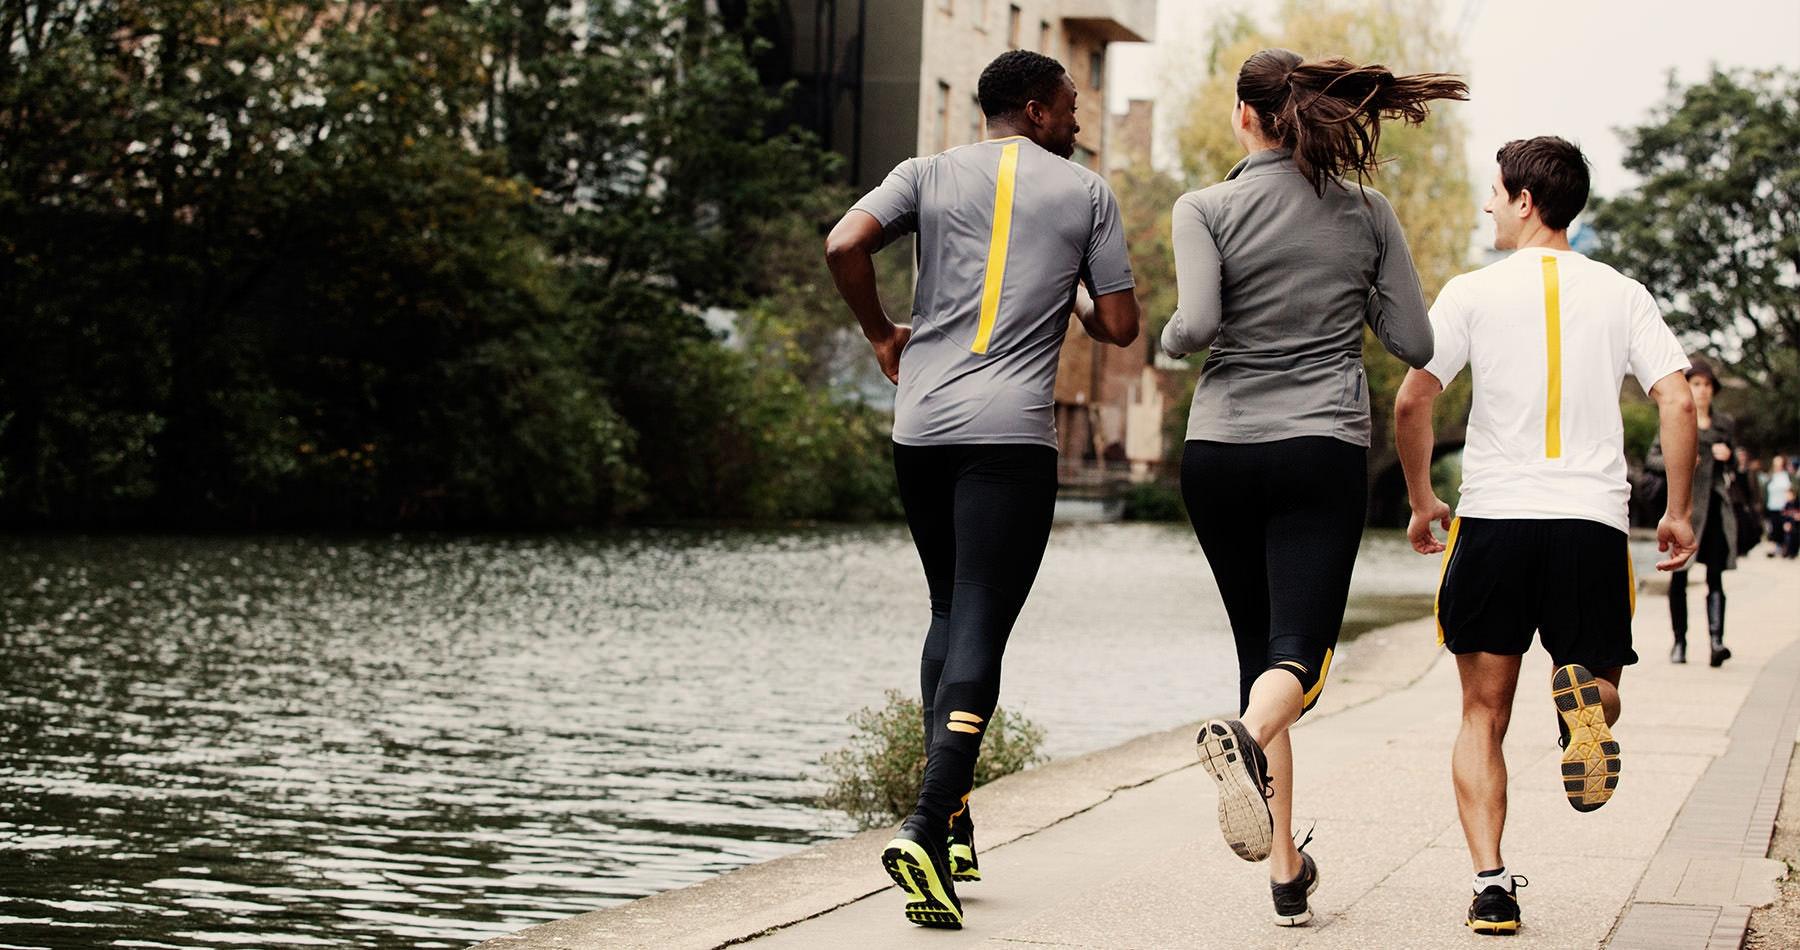 Tribesports Core Women's Running Capris Tights Black Yellow 8